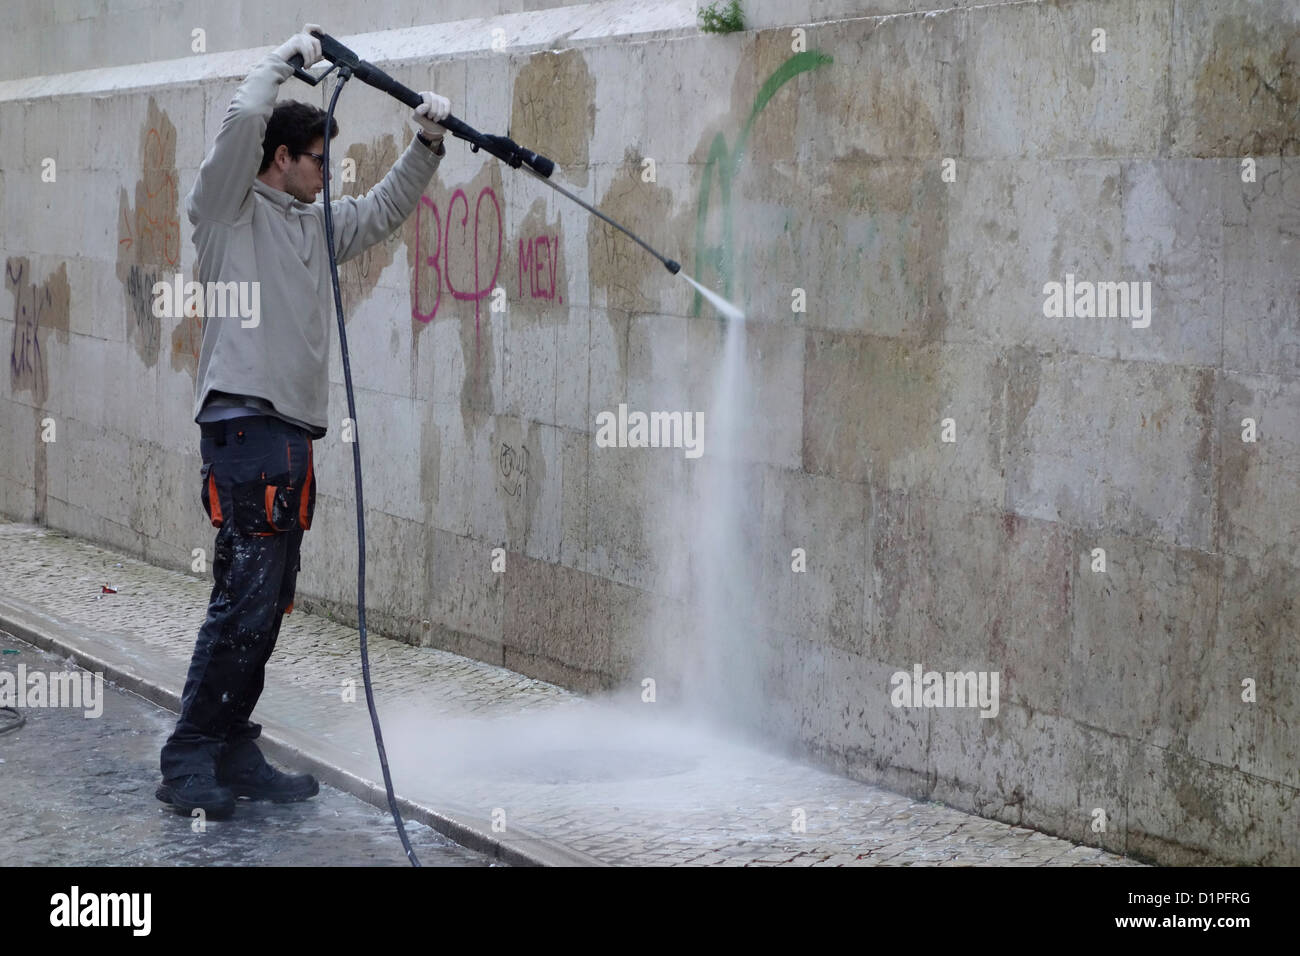 remove grafitti spray vandalism lisbon portugal - Stock Image